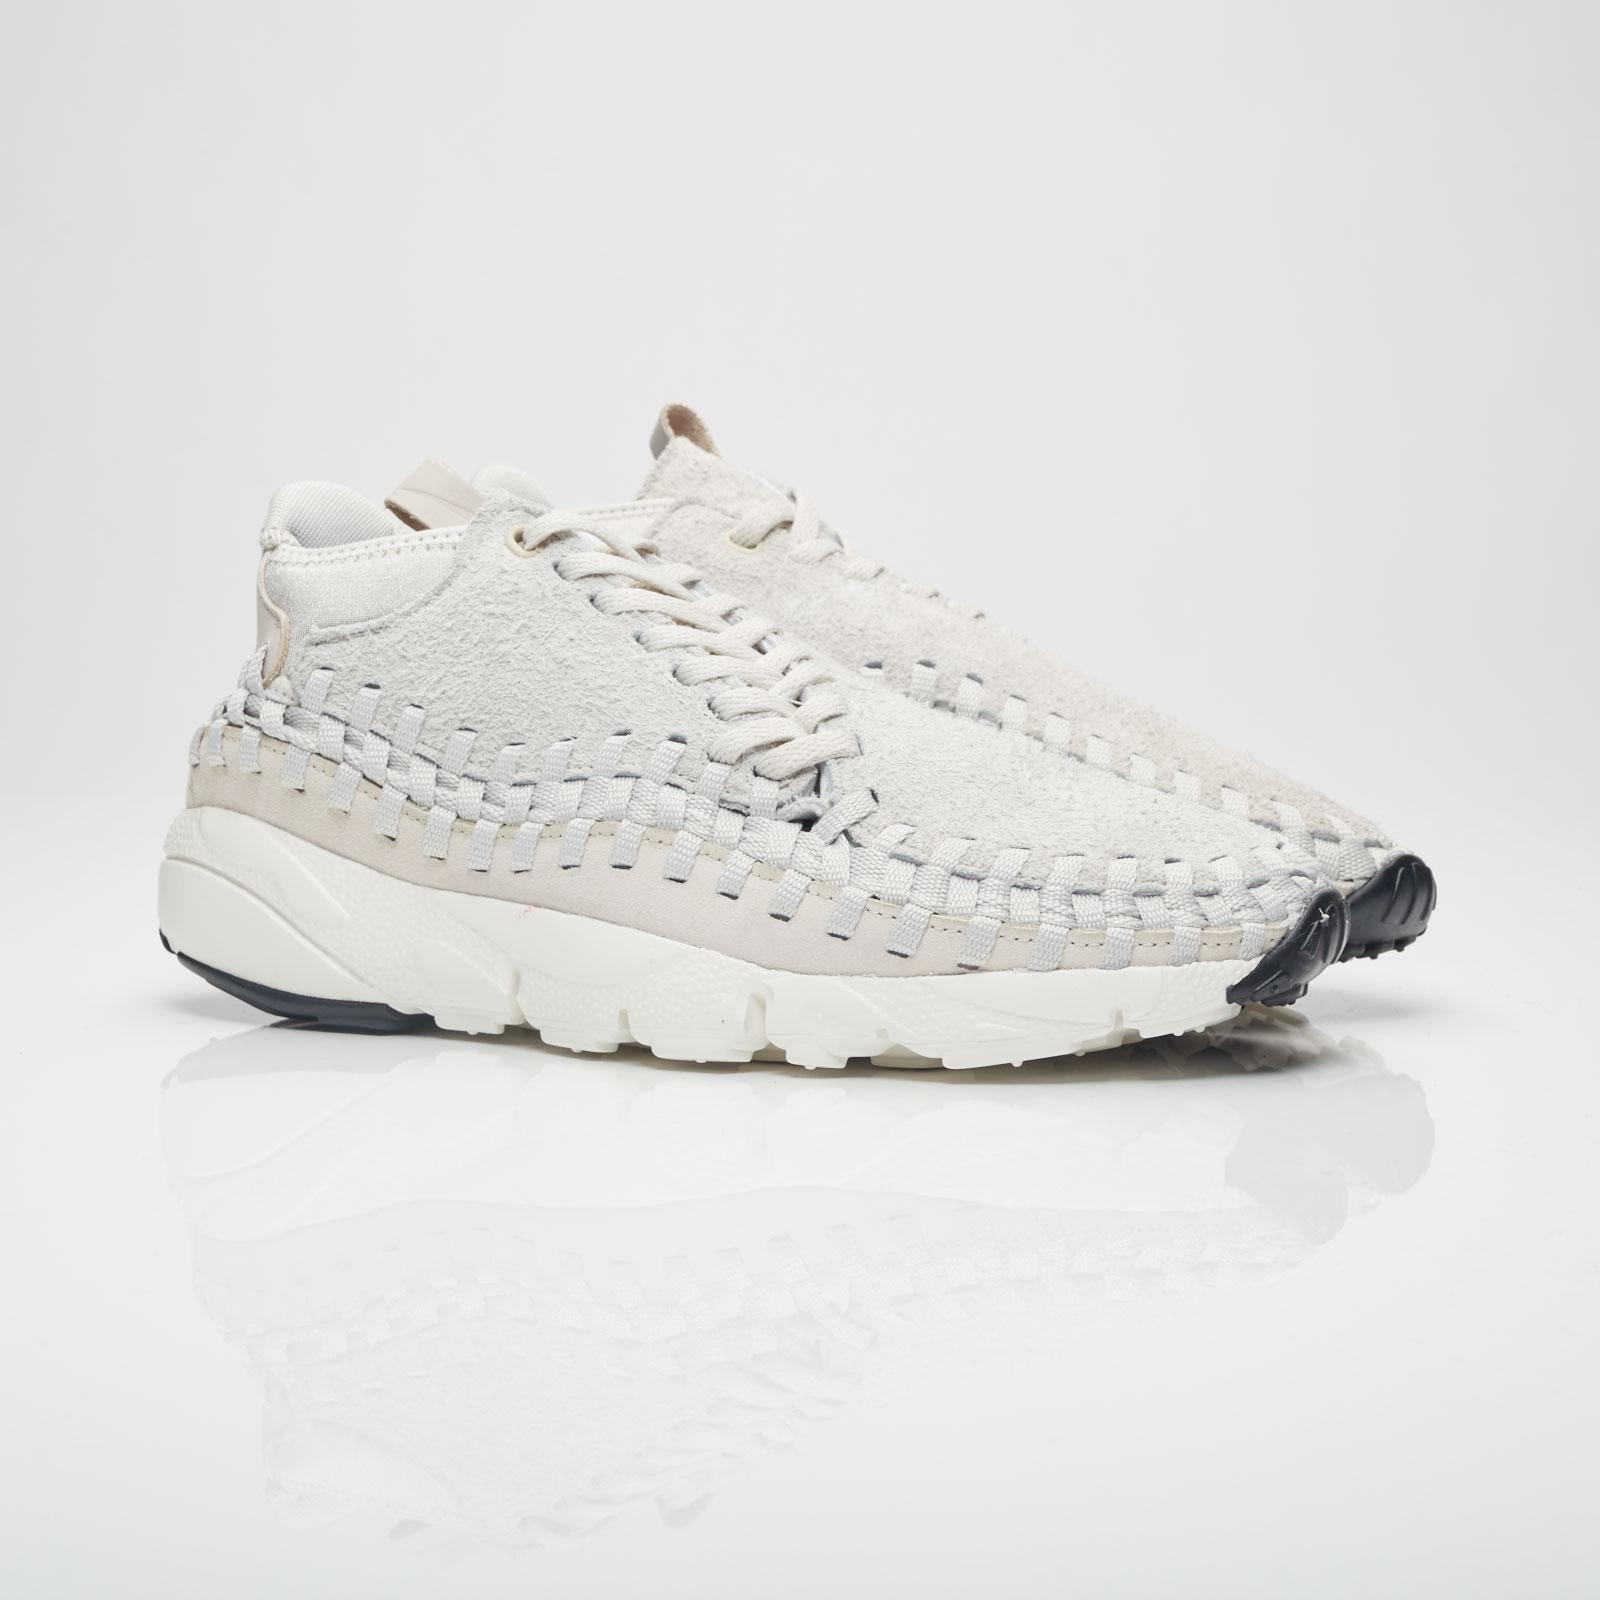 sports shoes 2f7f8 1a0be Nike Sportswear Air Footscape Woven Chukka Qs